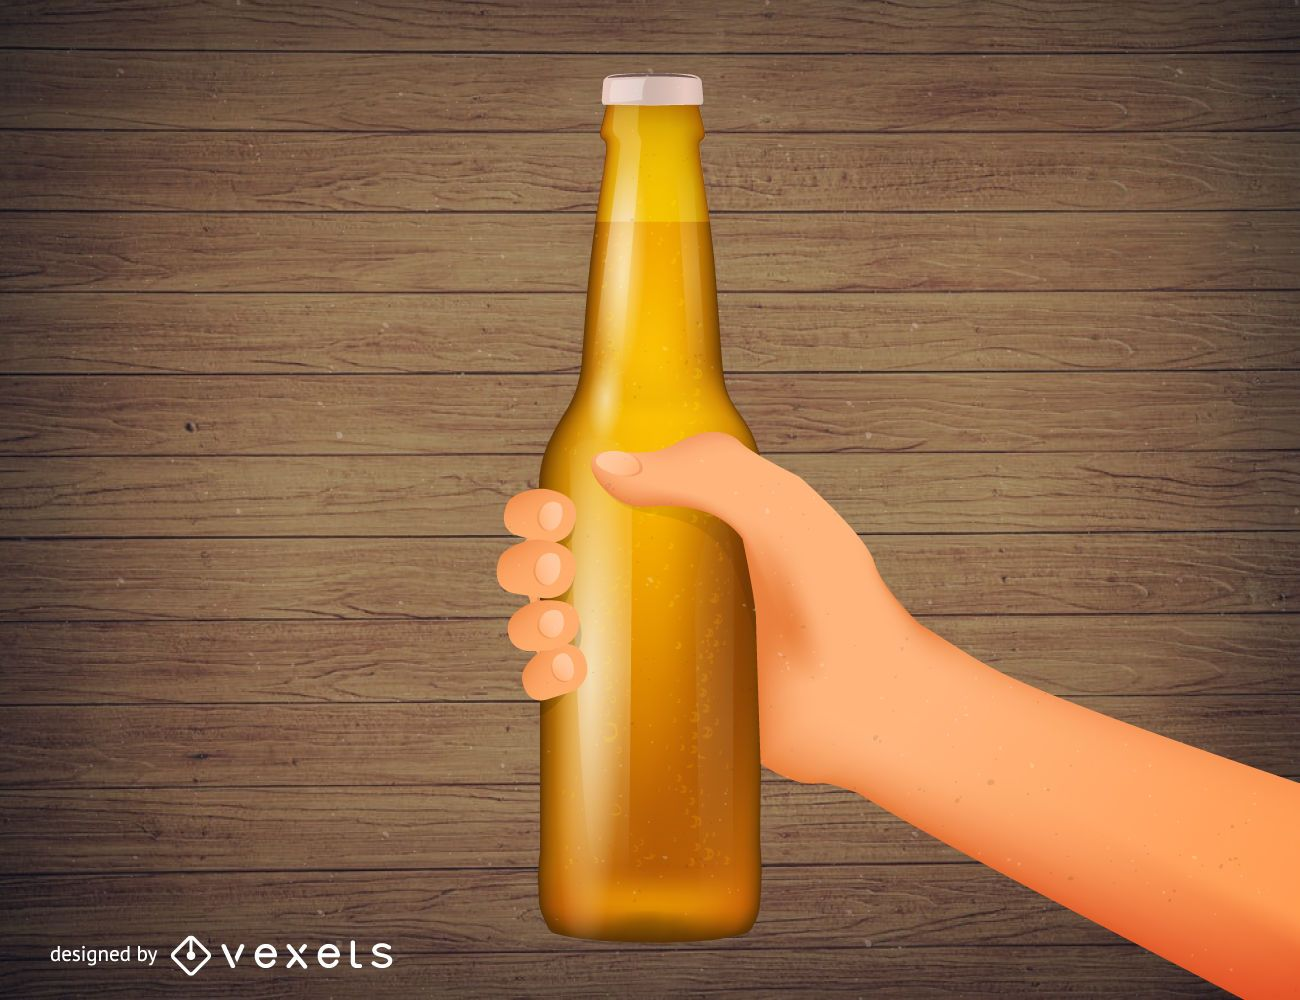 Hand holding beer bottle realistic illustration